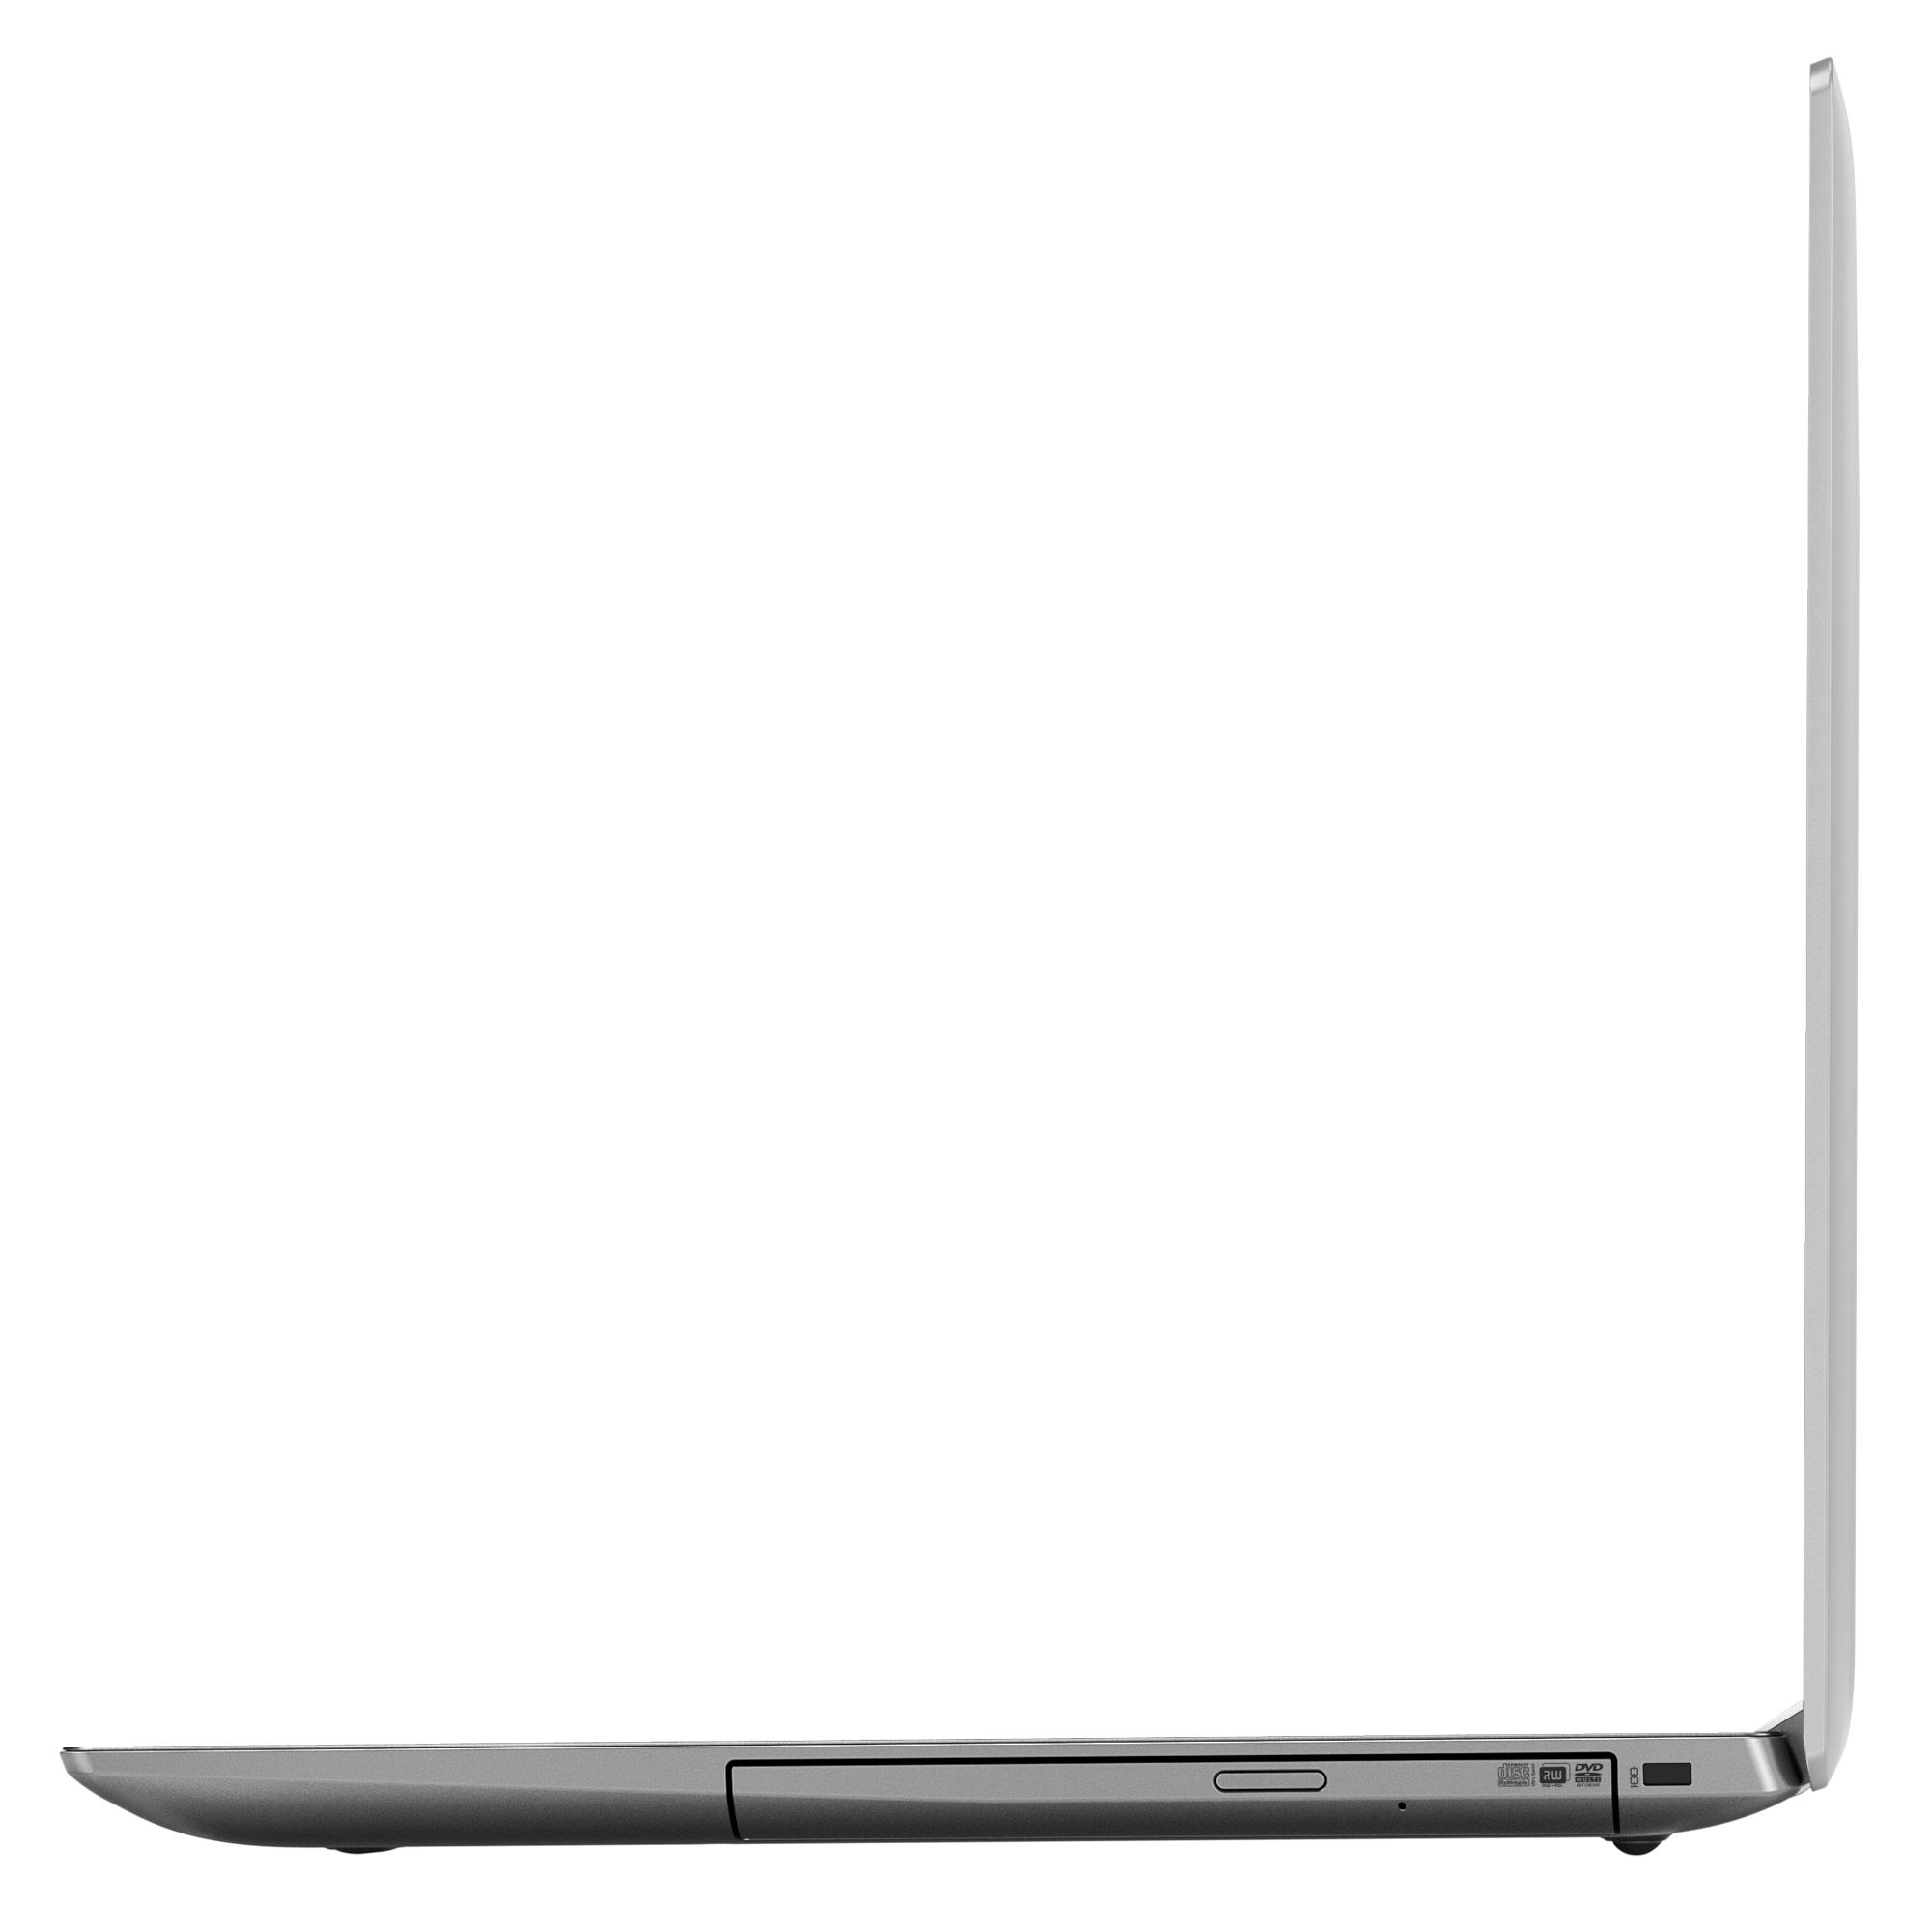 Фото  Ноутбук Lenovo ideapad 330-15 Platinum Grey (81DC00RLRA)